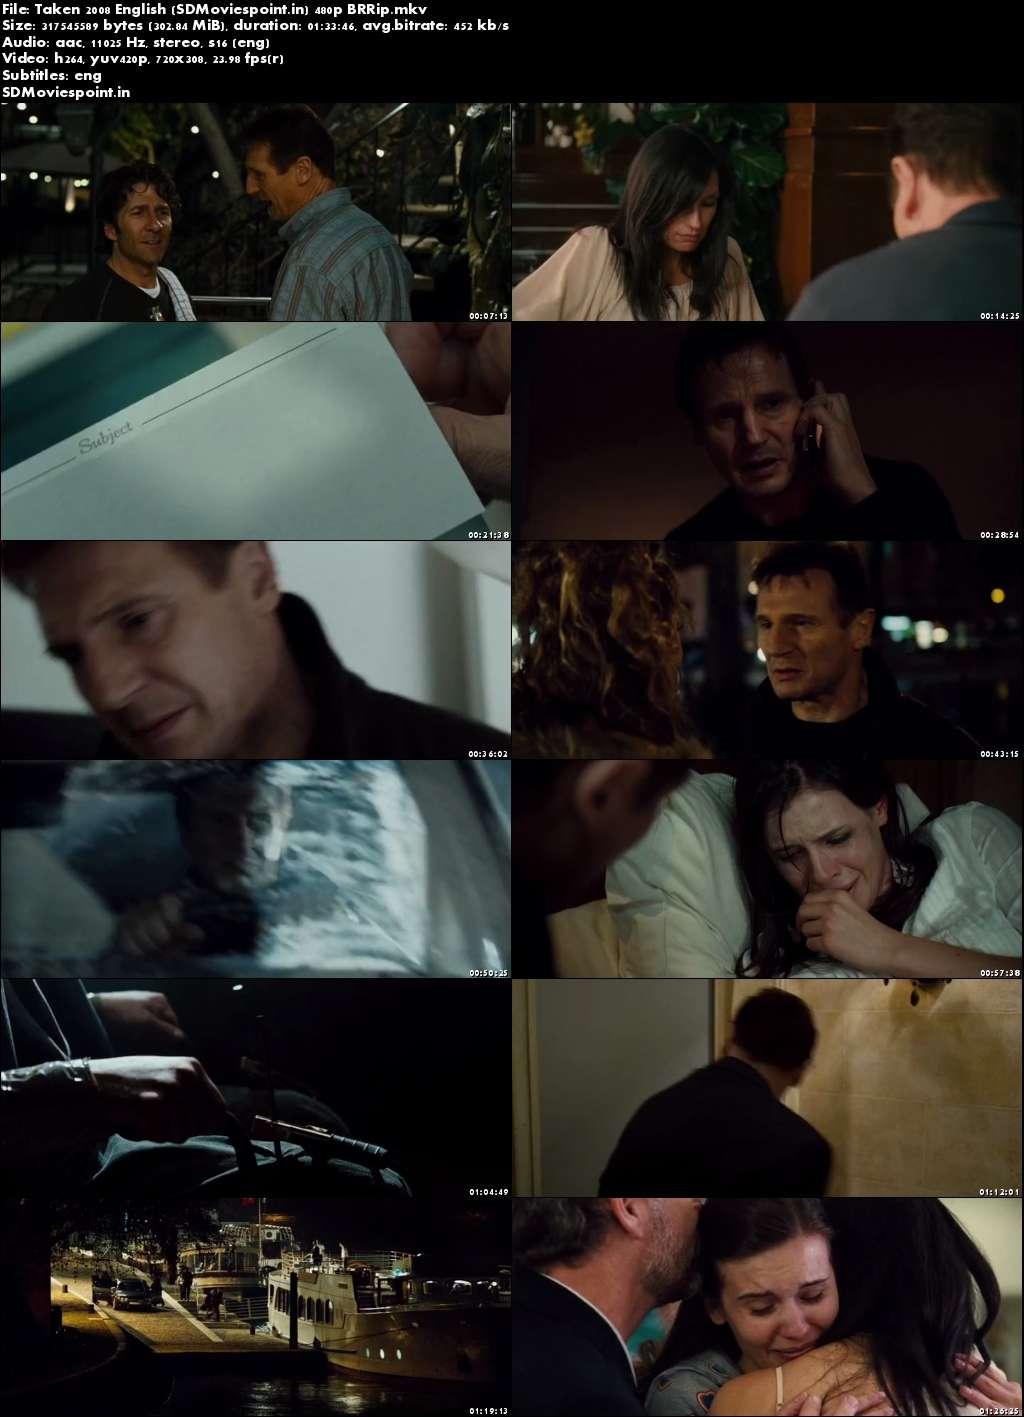 Screen Shots Taken 2008 Full HD Movie Download in English 720p